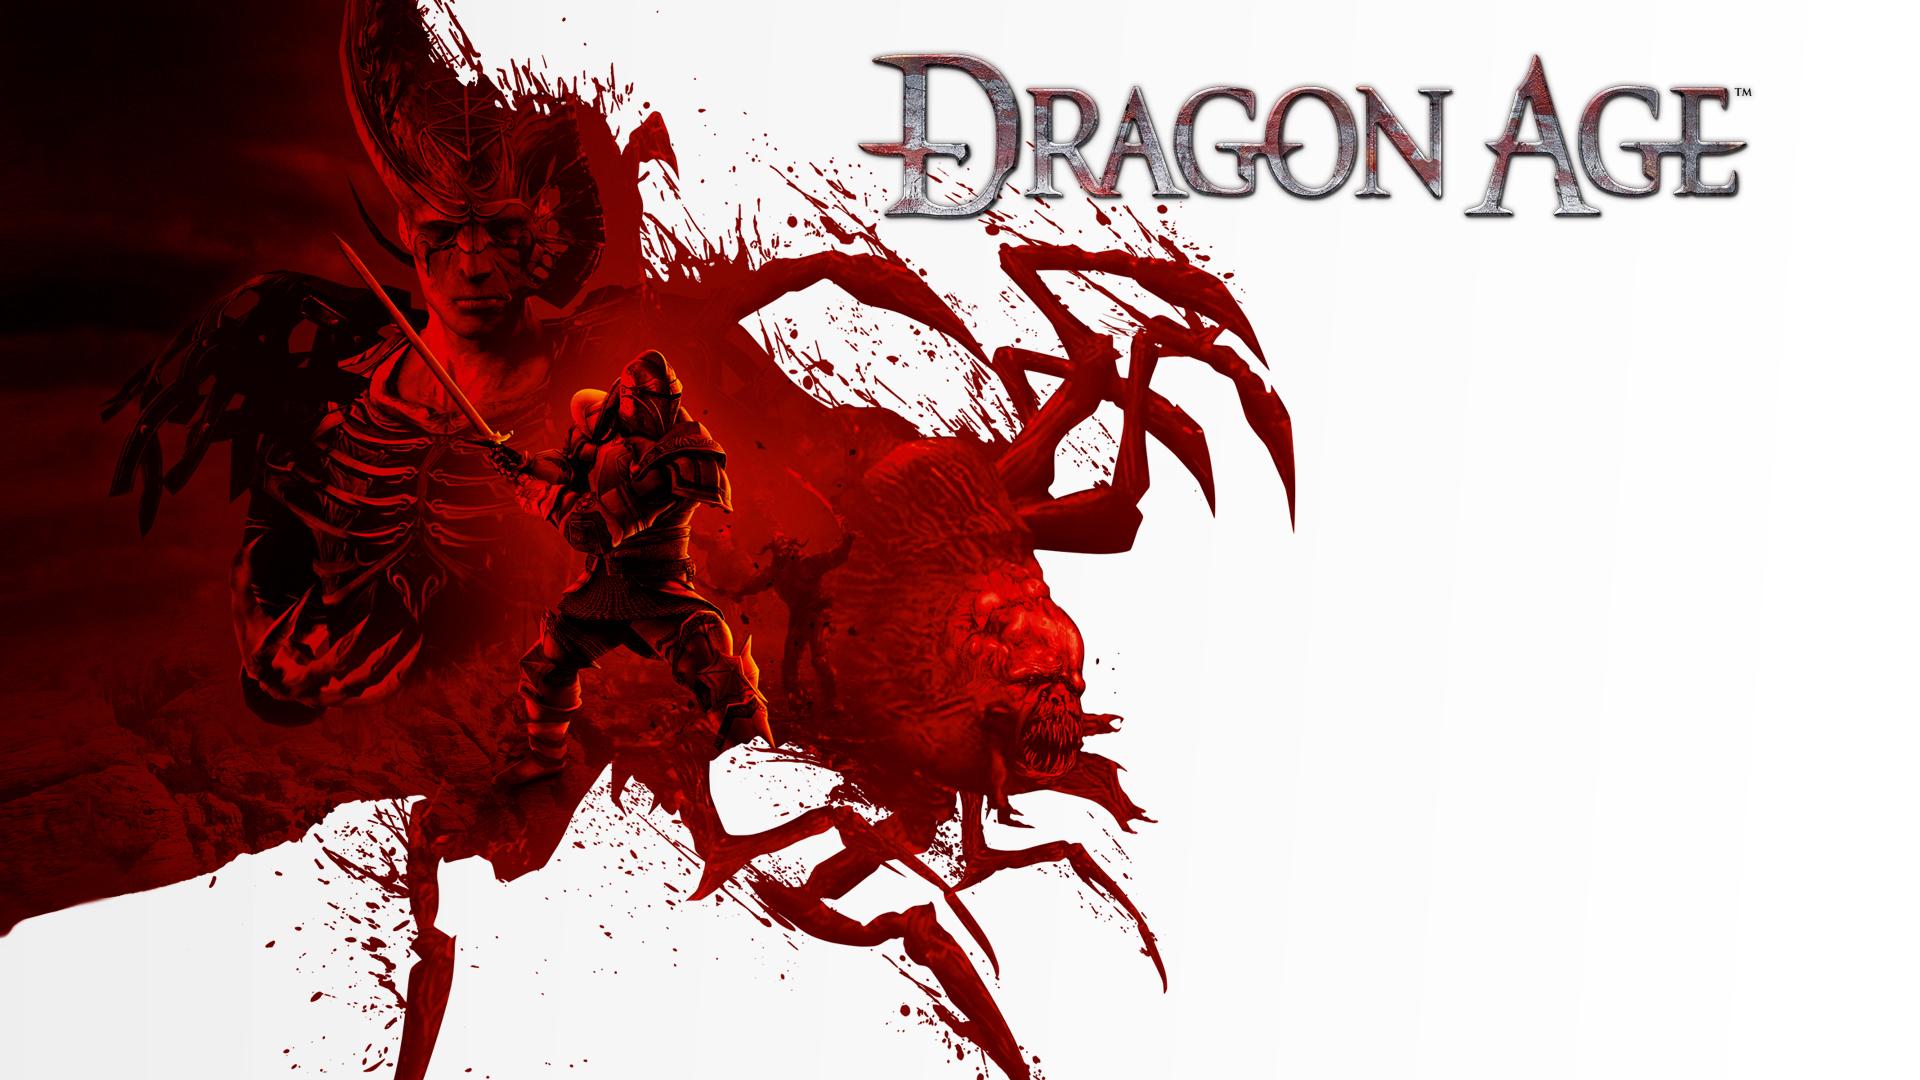 Руководство по переводу модификаций Dragon Age: Начало.